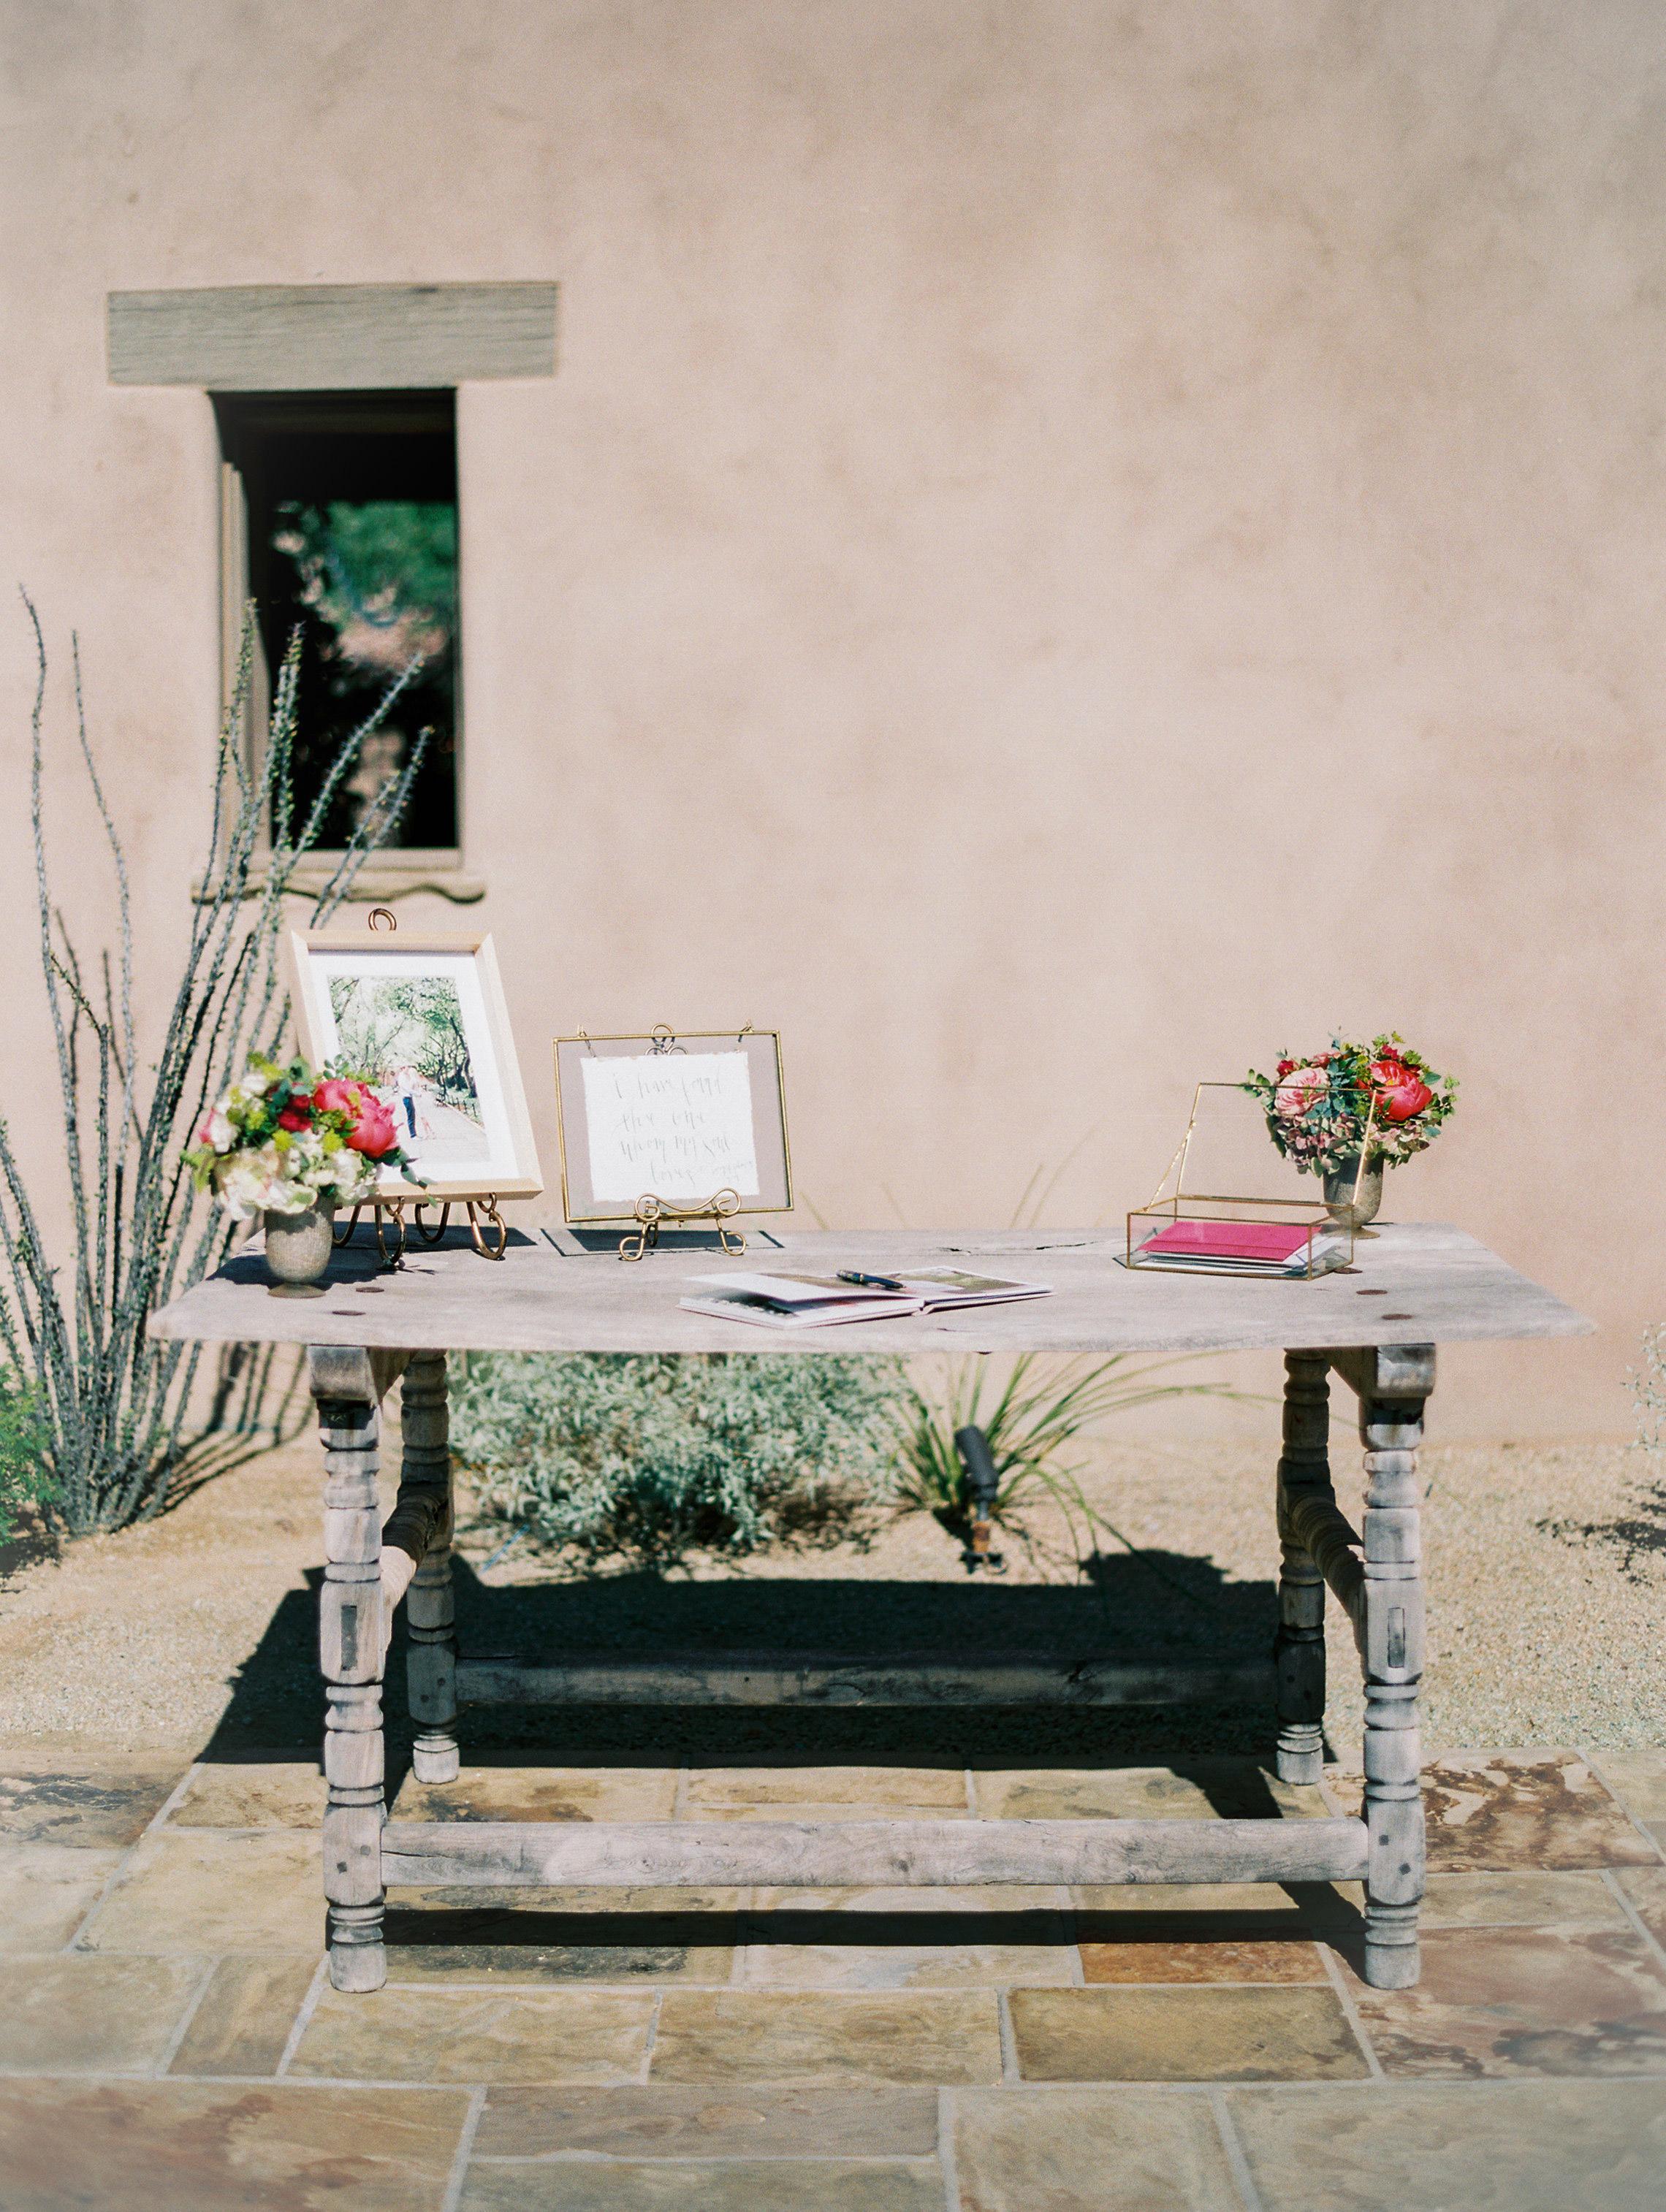 wedding gift tables rachel solomon photography wooden table